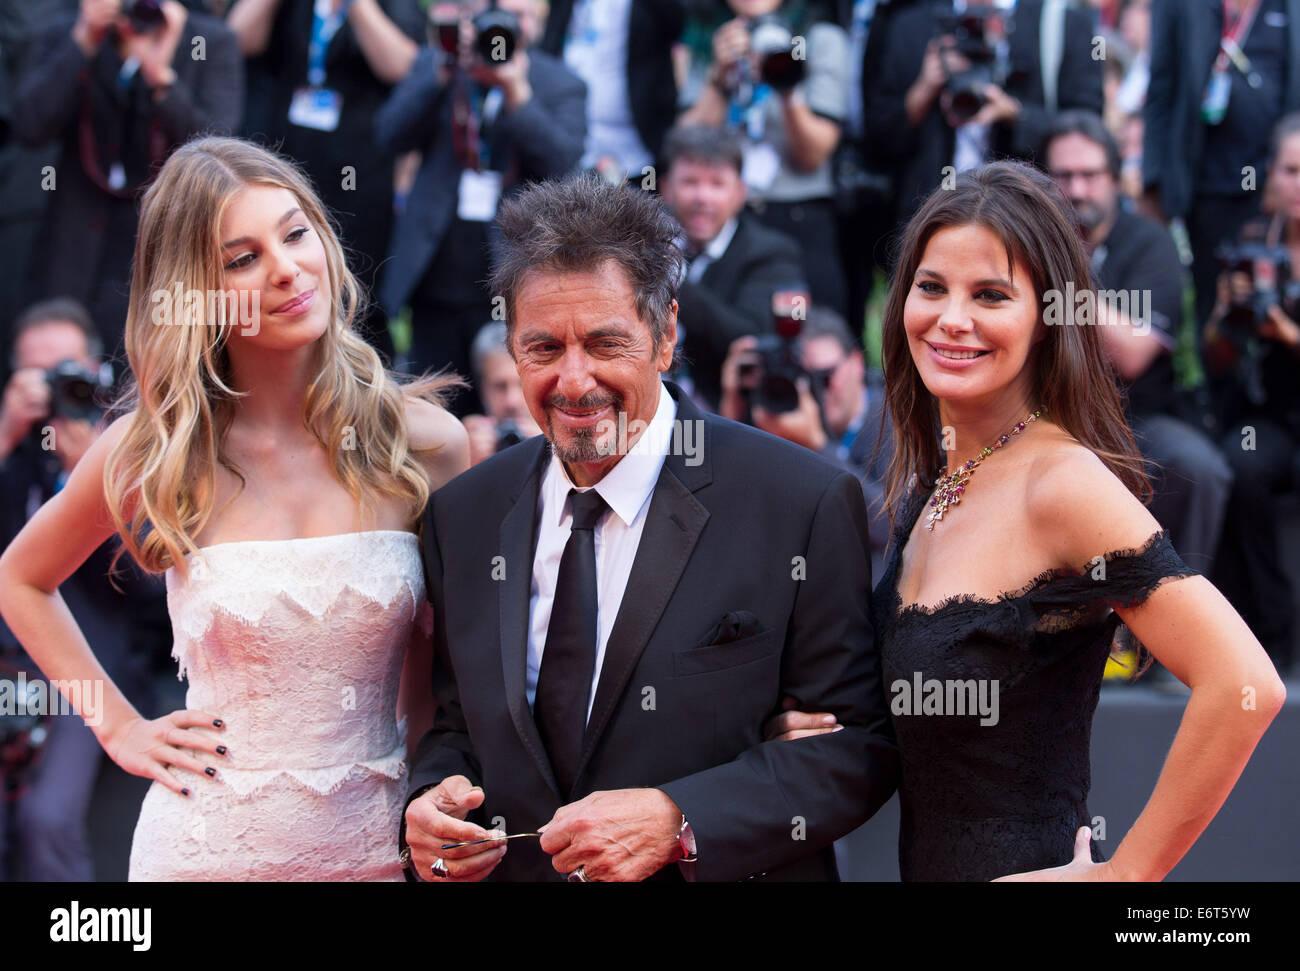 Leonardos Girlfriend Is Al Pacinos Stepdaughter Camila Morrone